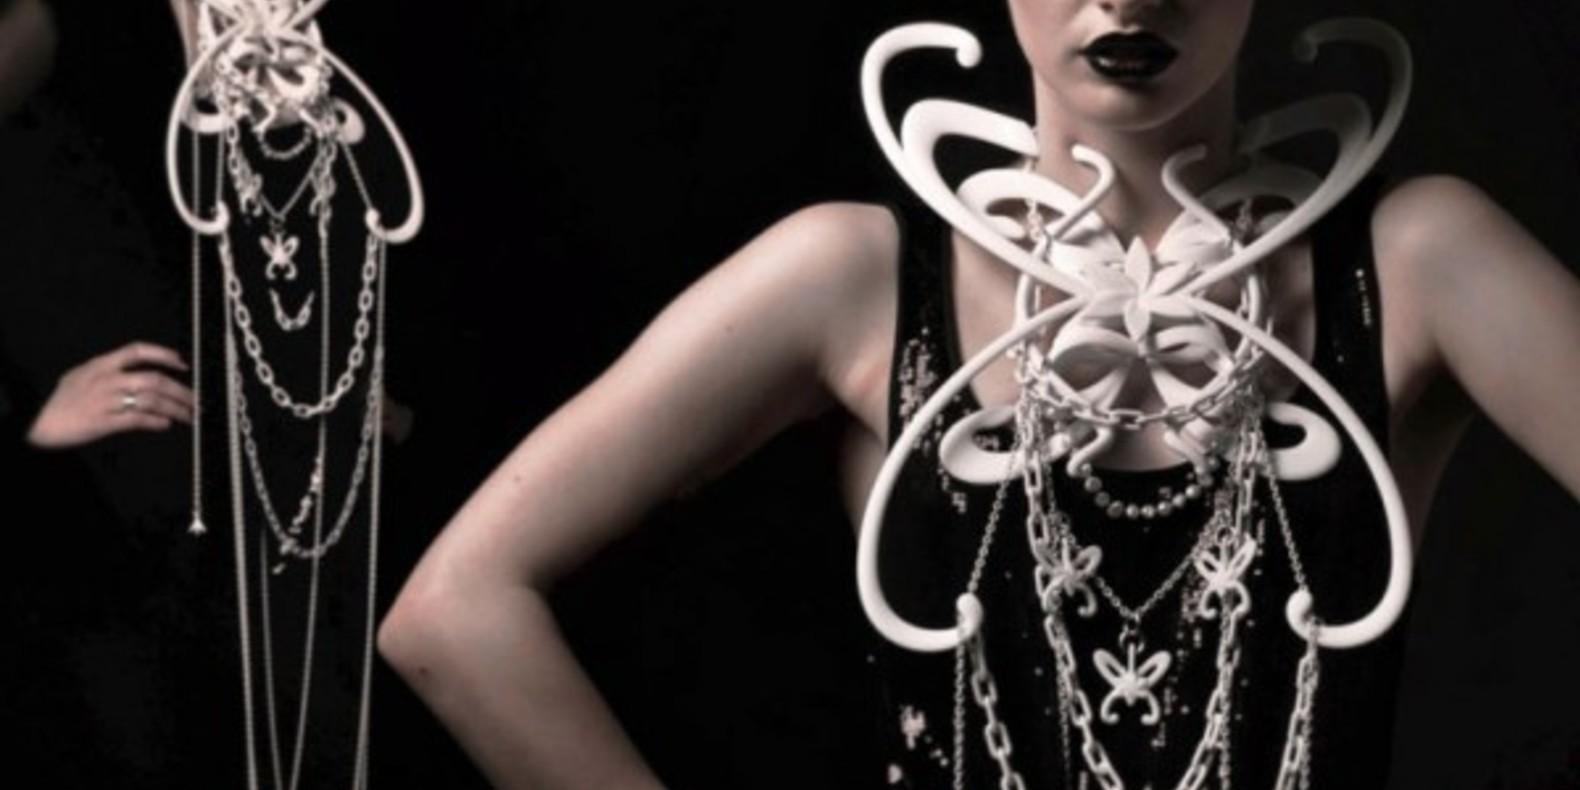 rob elfort 3D printing impression 3D jewlery bijoux vêtements cults cults 3D fichier 3D 1